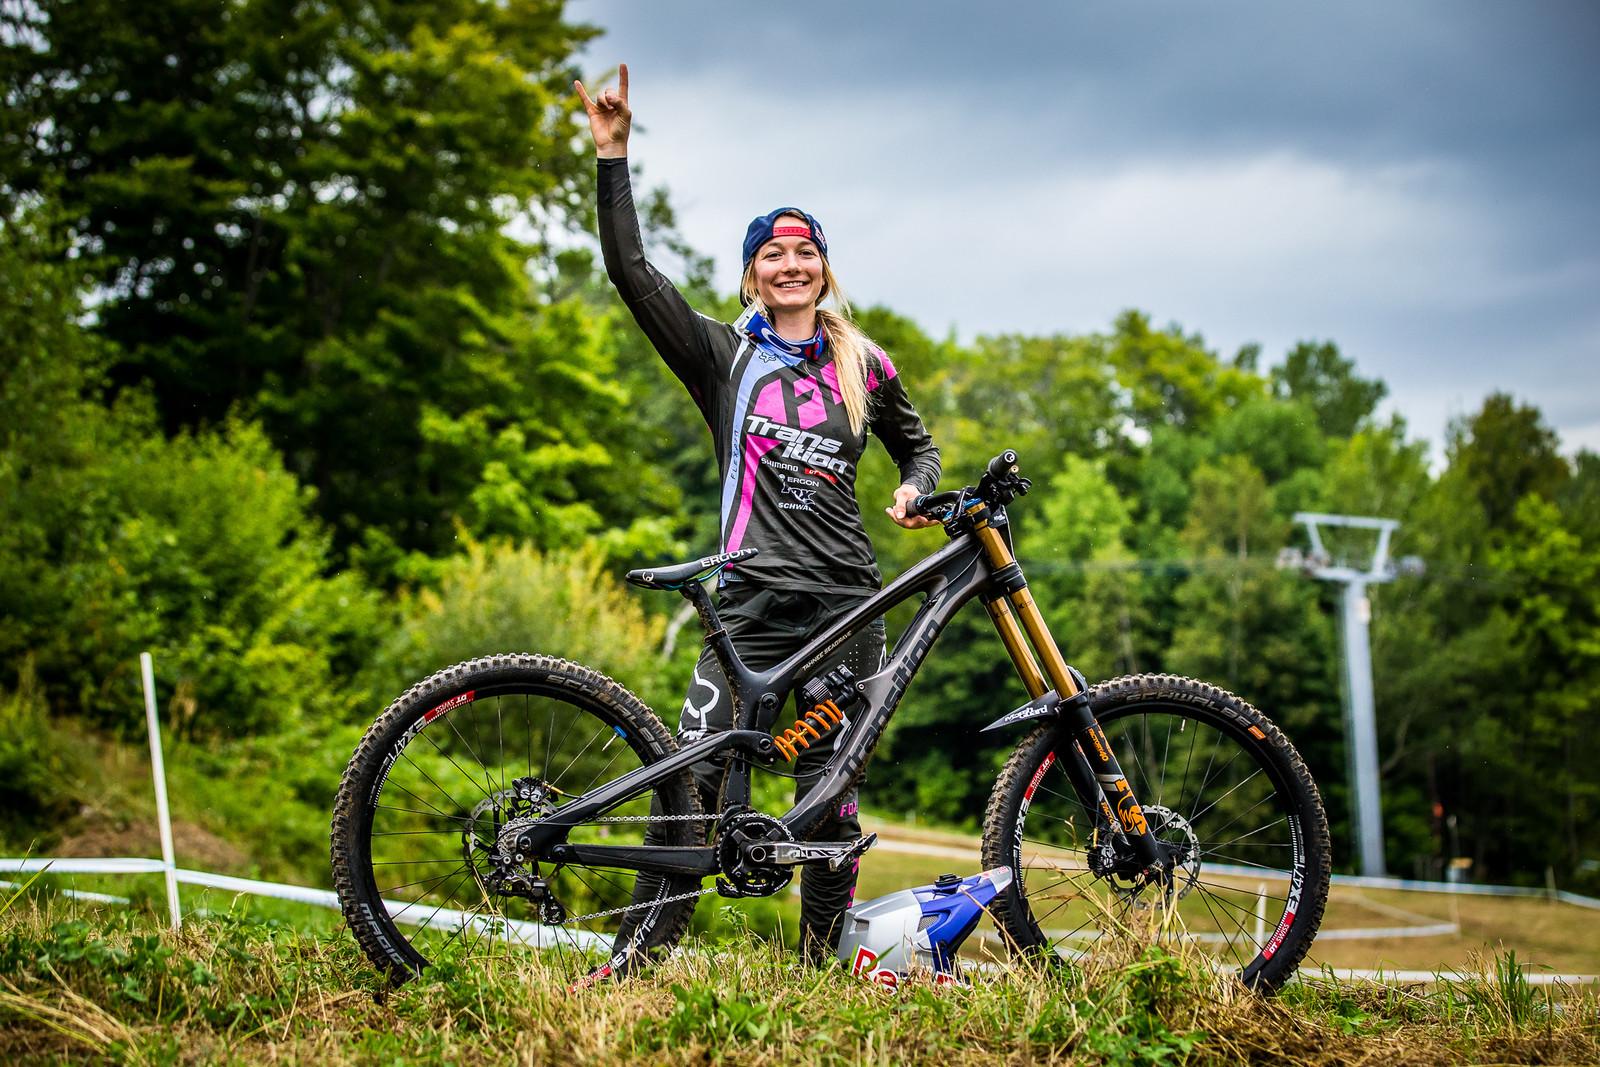 MSA17 N3X3790 - WINNING BIKE: Tahnee Seagrave's Transition TR11 - Mountain Biking Pictures - Vital MTB